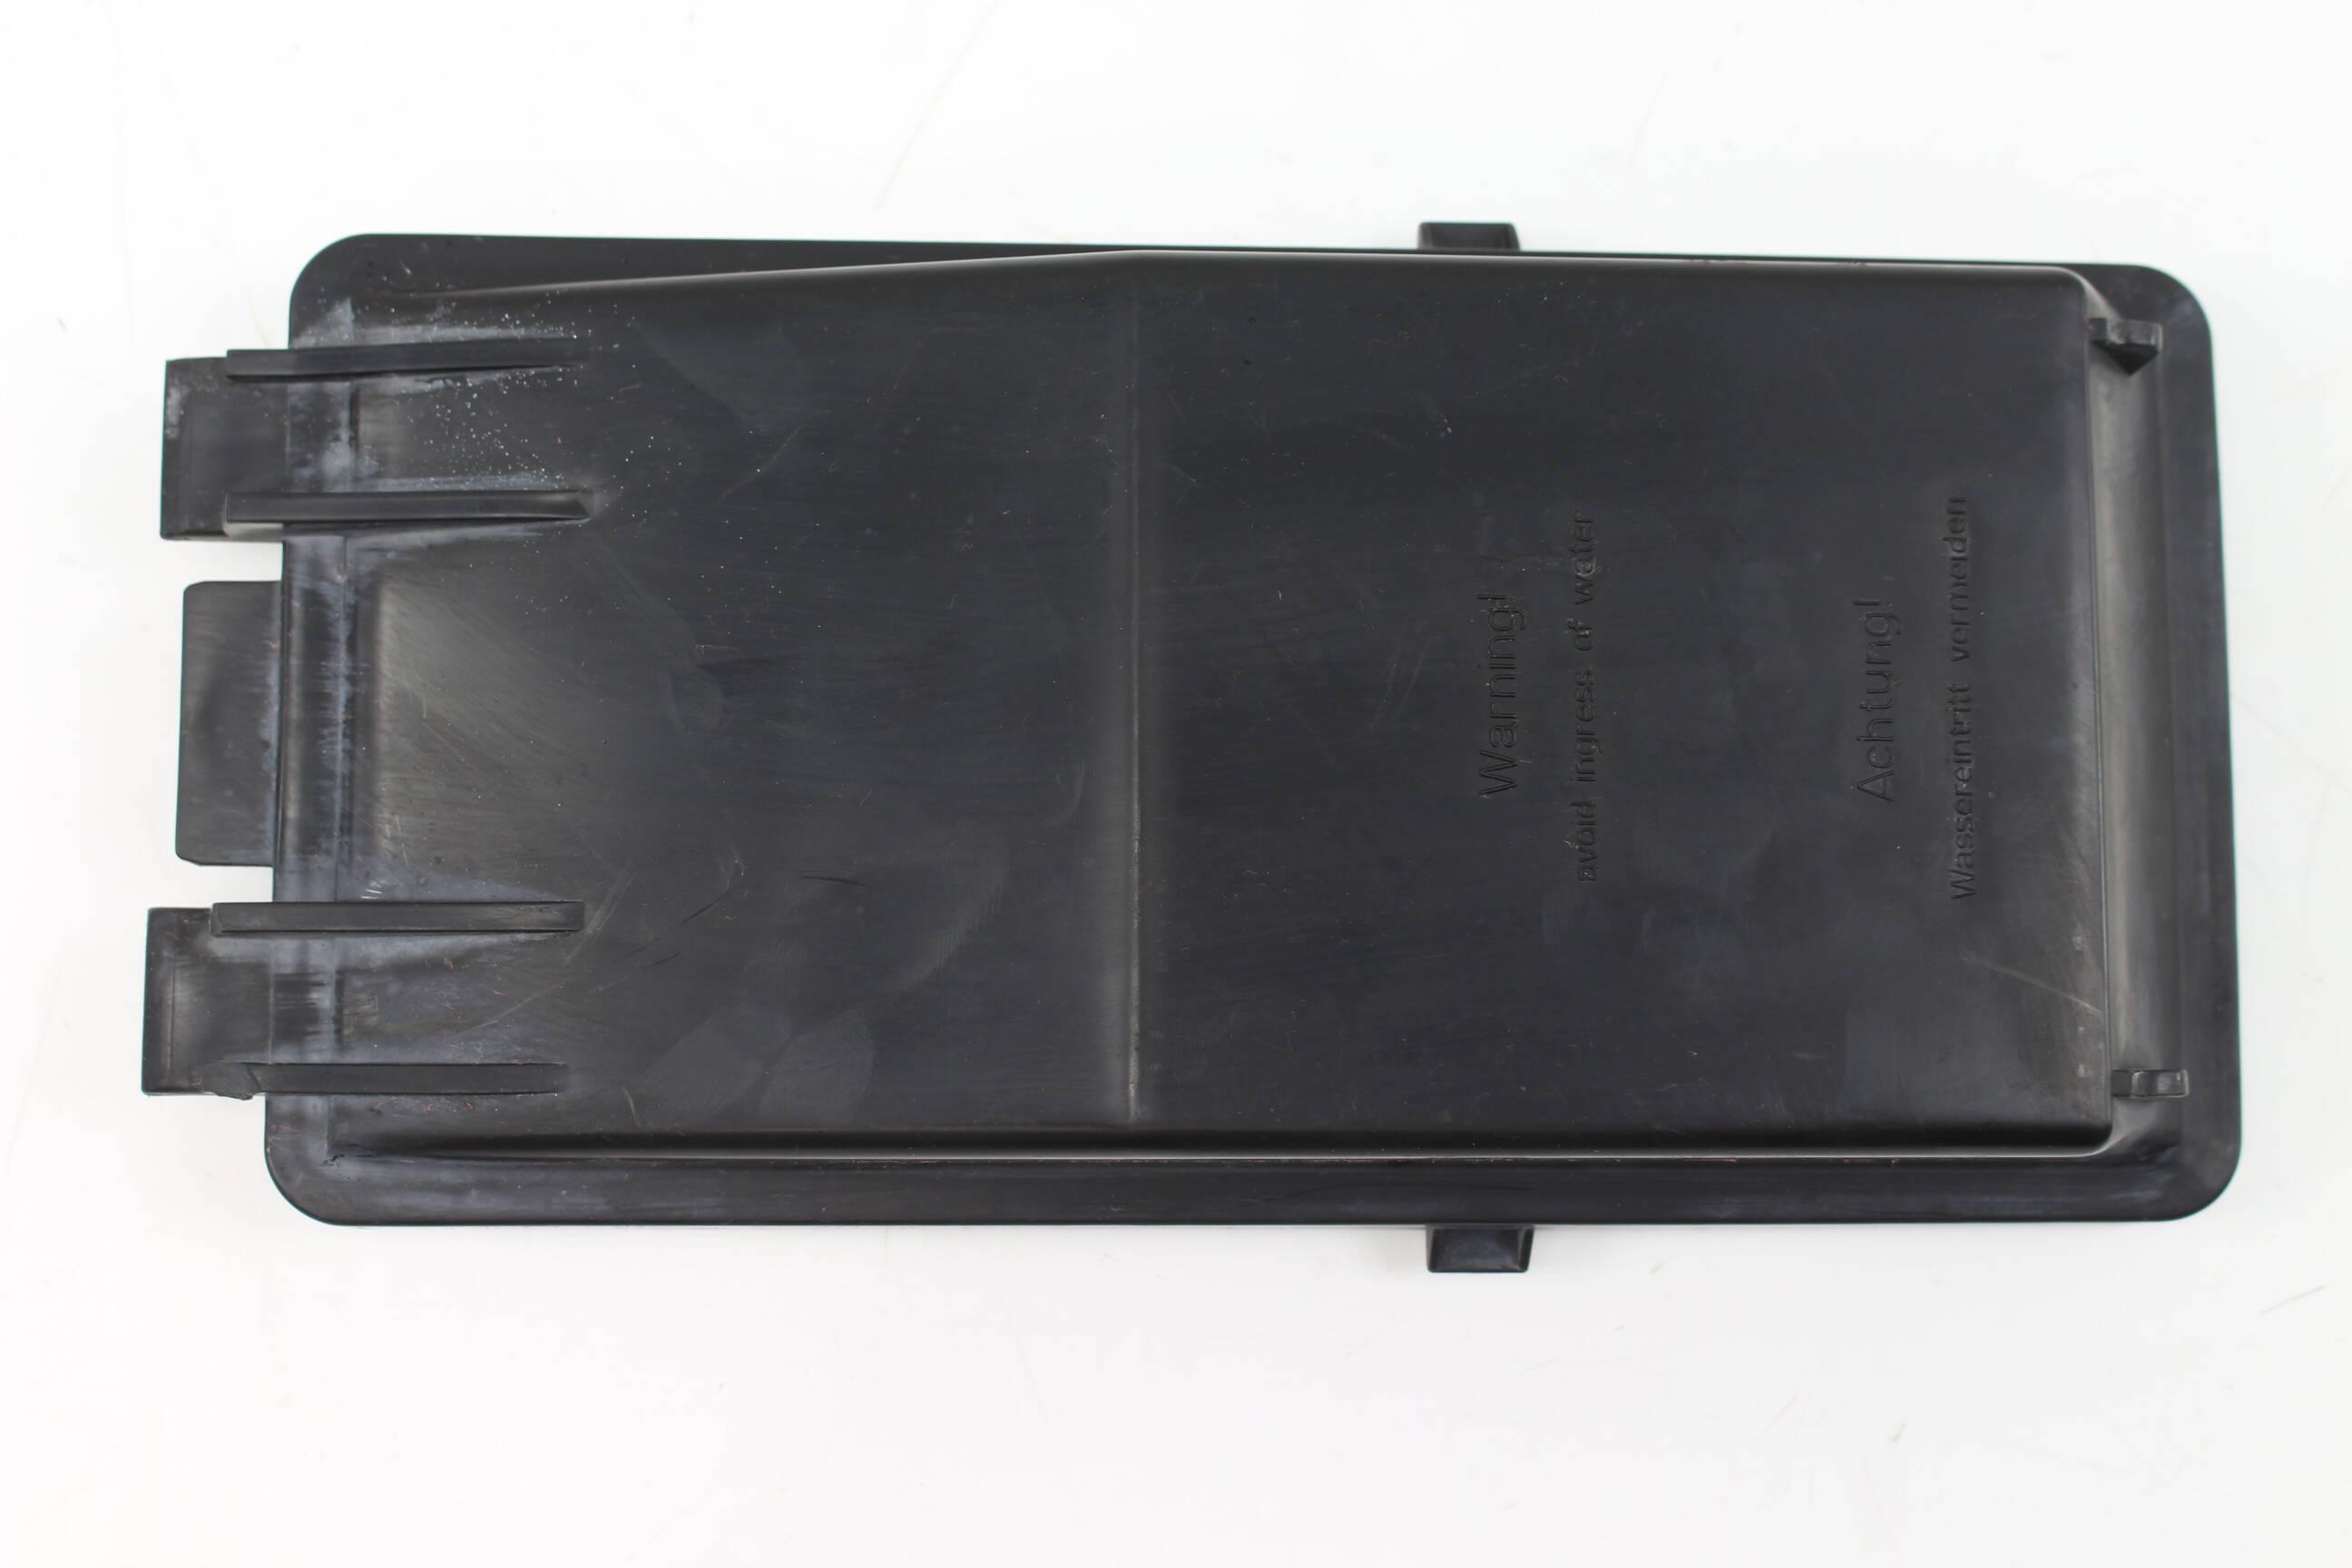 1995 1996 1997 AUDI A6 C4 - RELAY / FUSE BOX COVER | eBayeBay